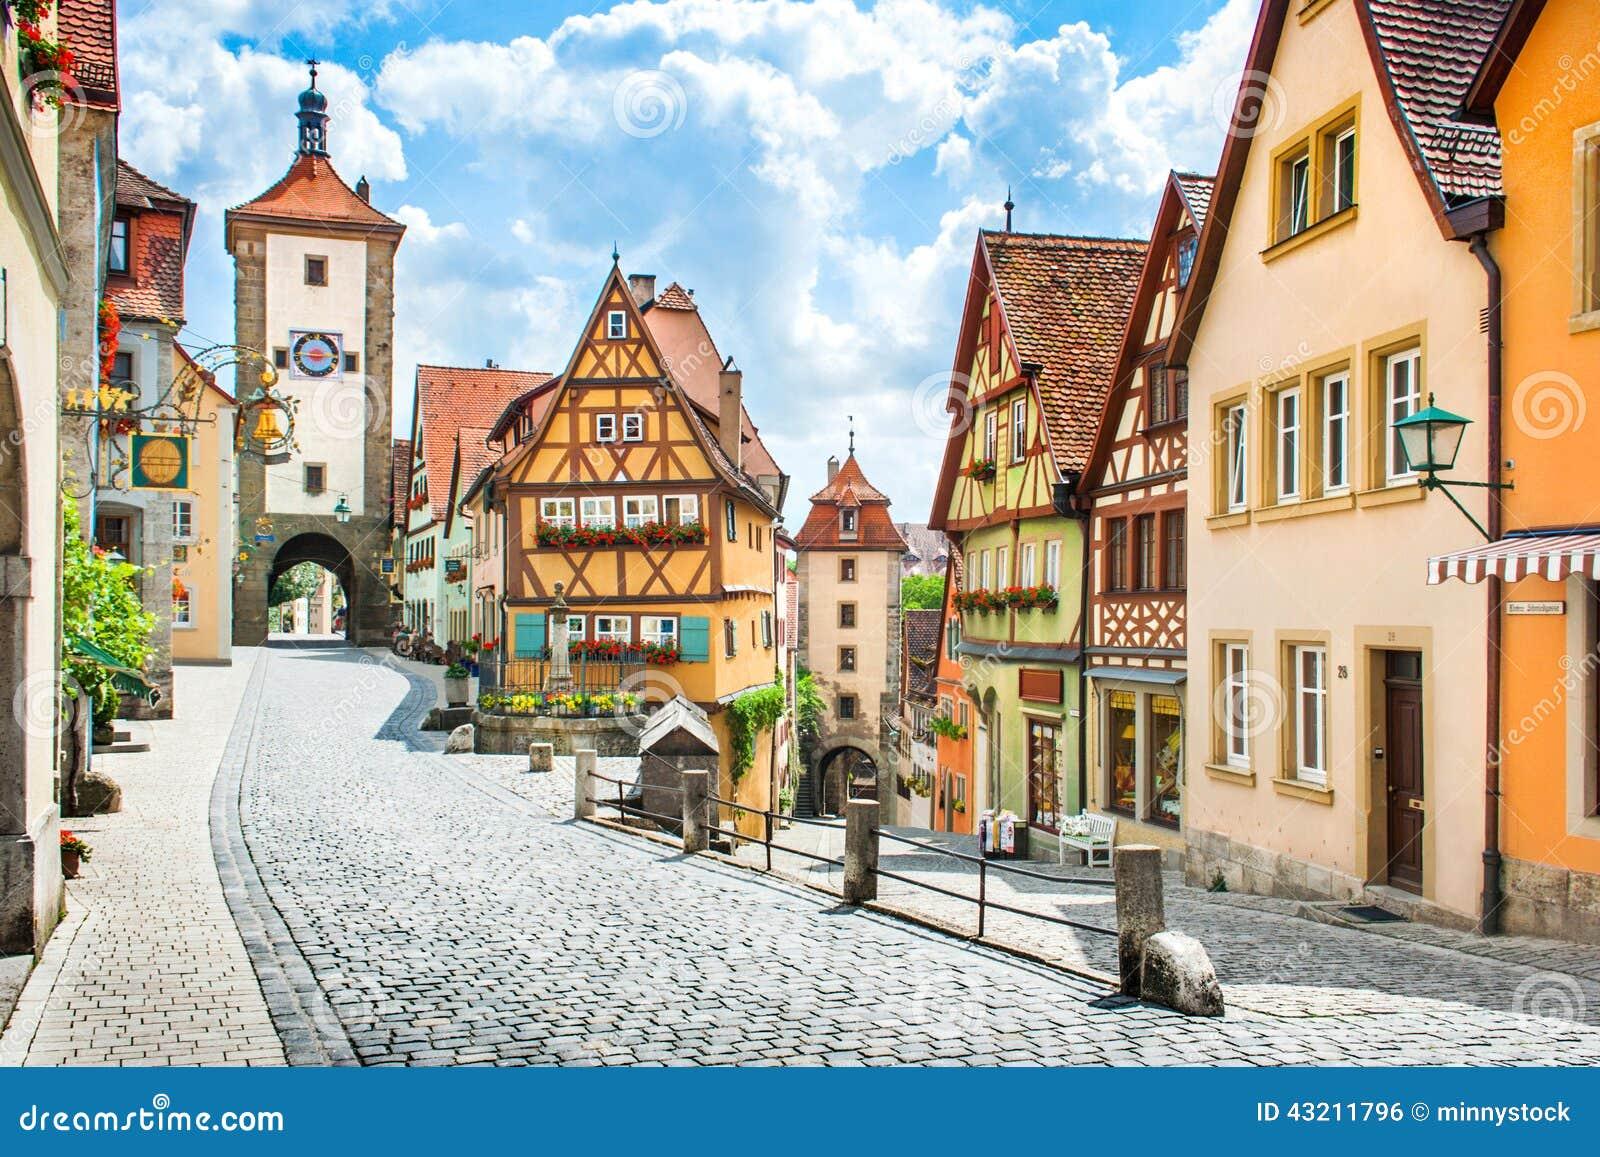 Historic town of Rothenburg ob der Tauber, Bavaria, Germany